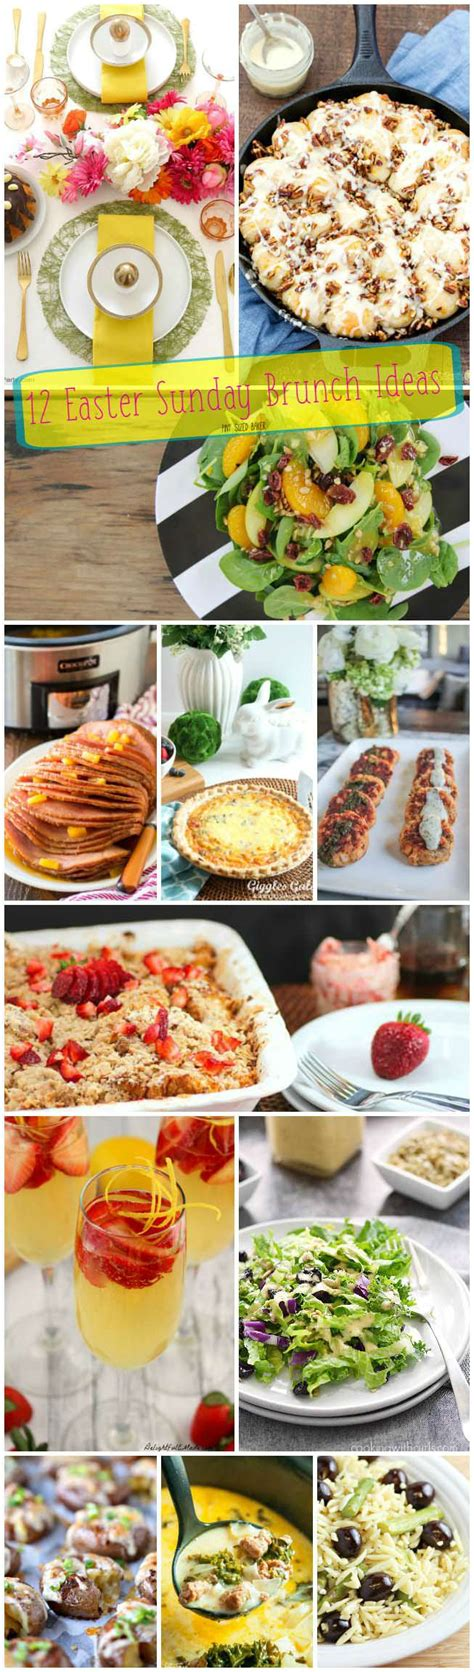 12 Easter Sunday Brunch Ideas Pint Sized Baker Easter Sunday Buffet